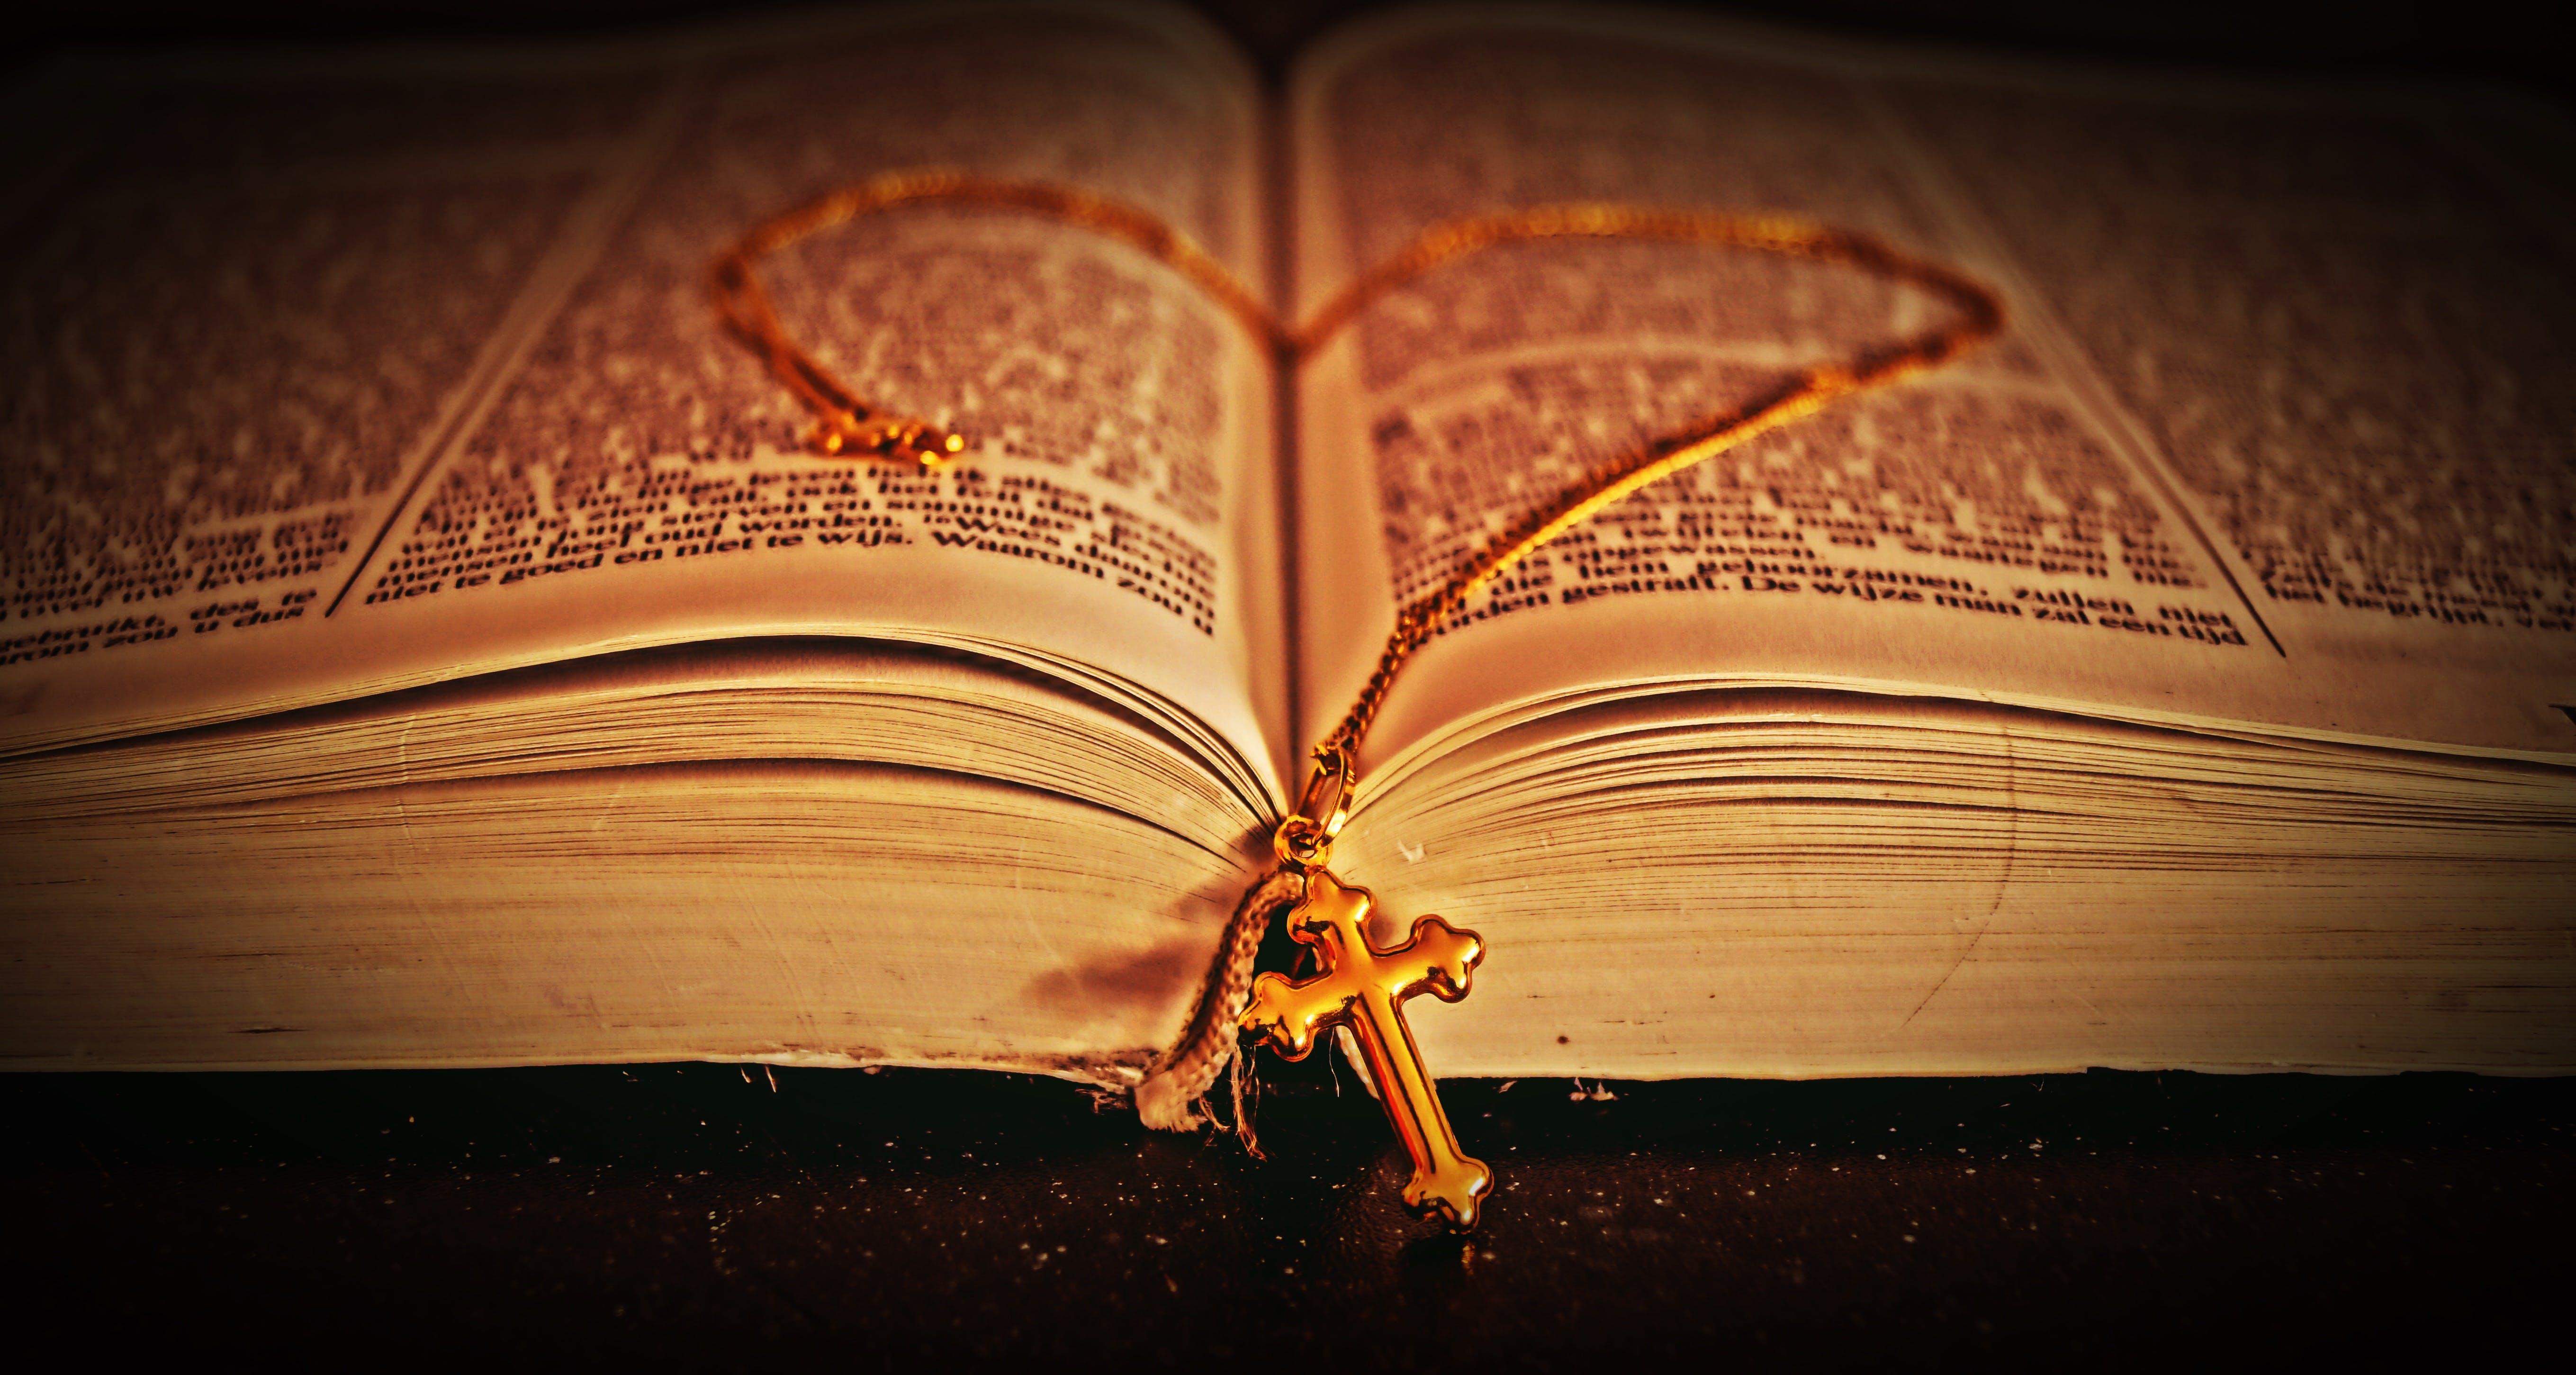 book, close-up, close-up view